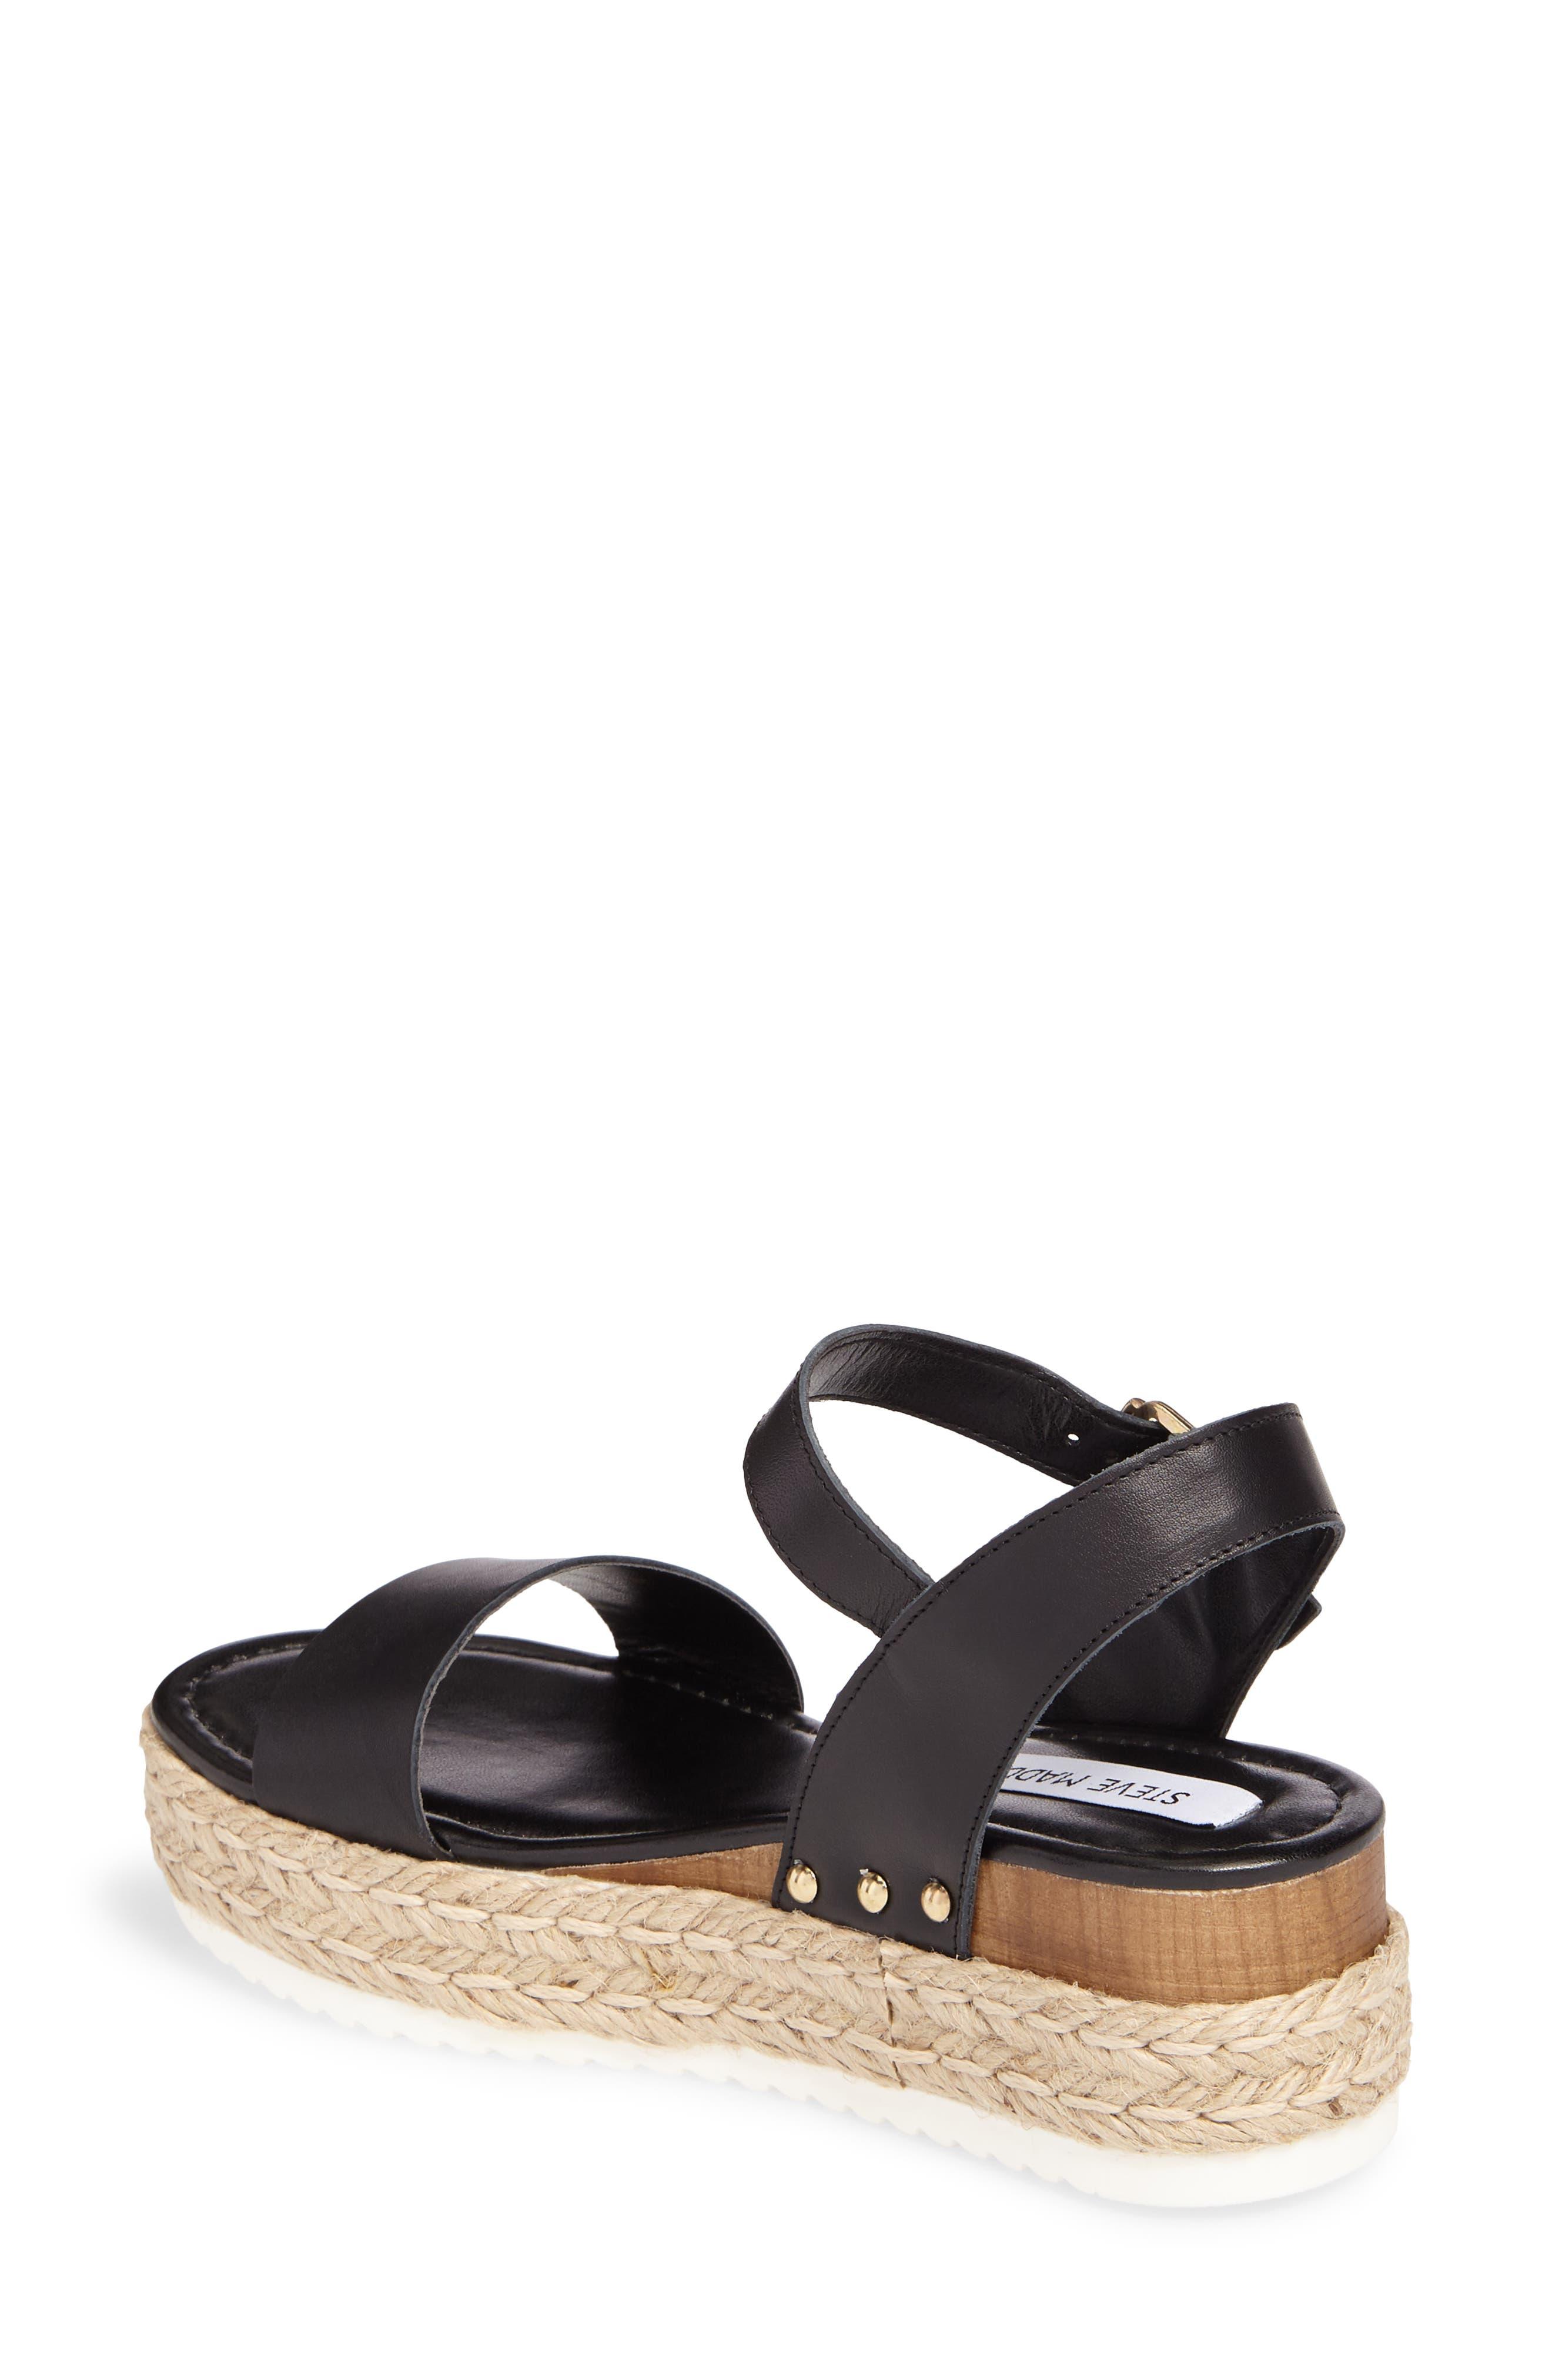 Chiara Platform Espadrille Sandal,                             Alternate thumbnail 2, color,                             Black Leather